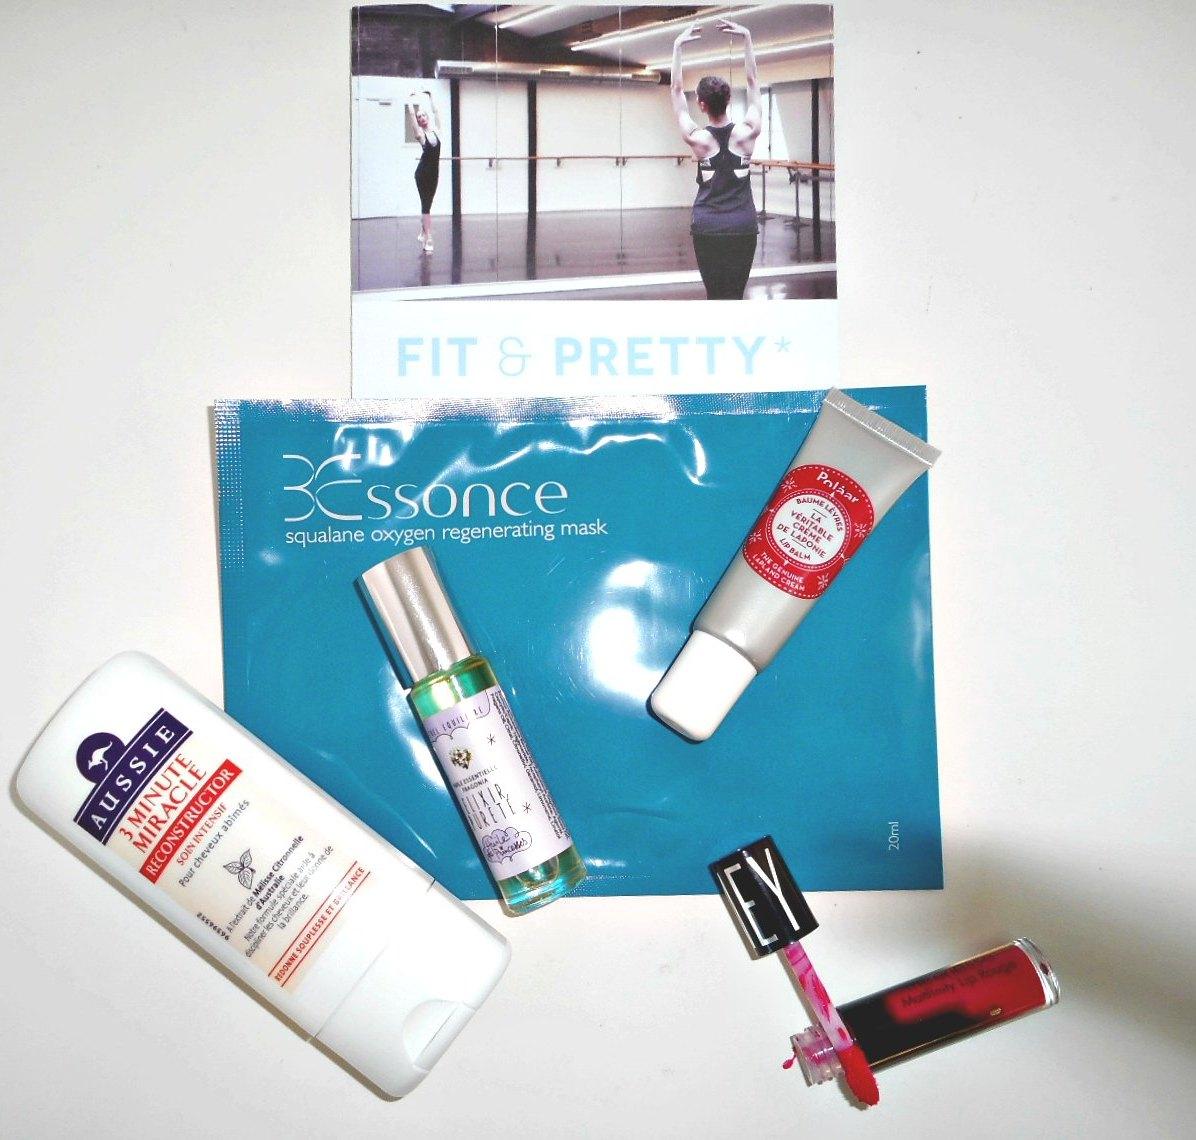 birchbox-fit-pretty-beaute-forme-janvier-2015-avis-test-contenu-spoiler